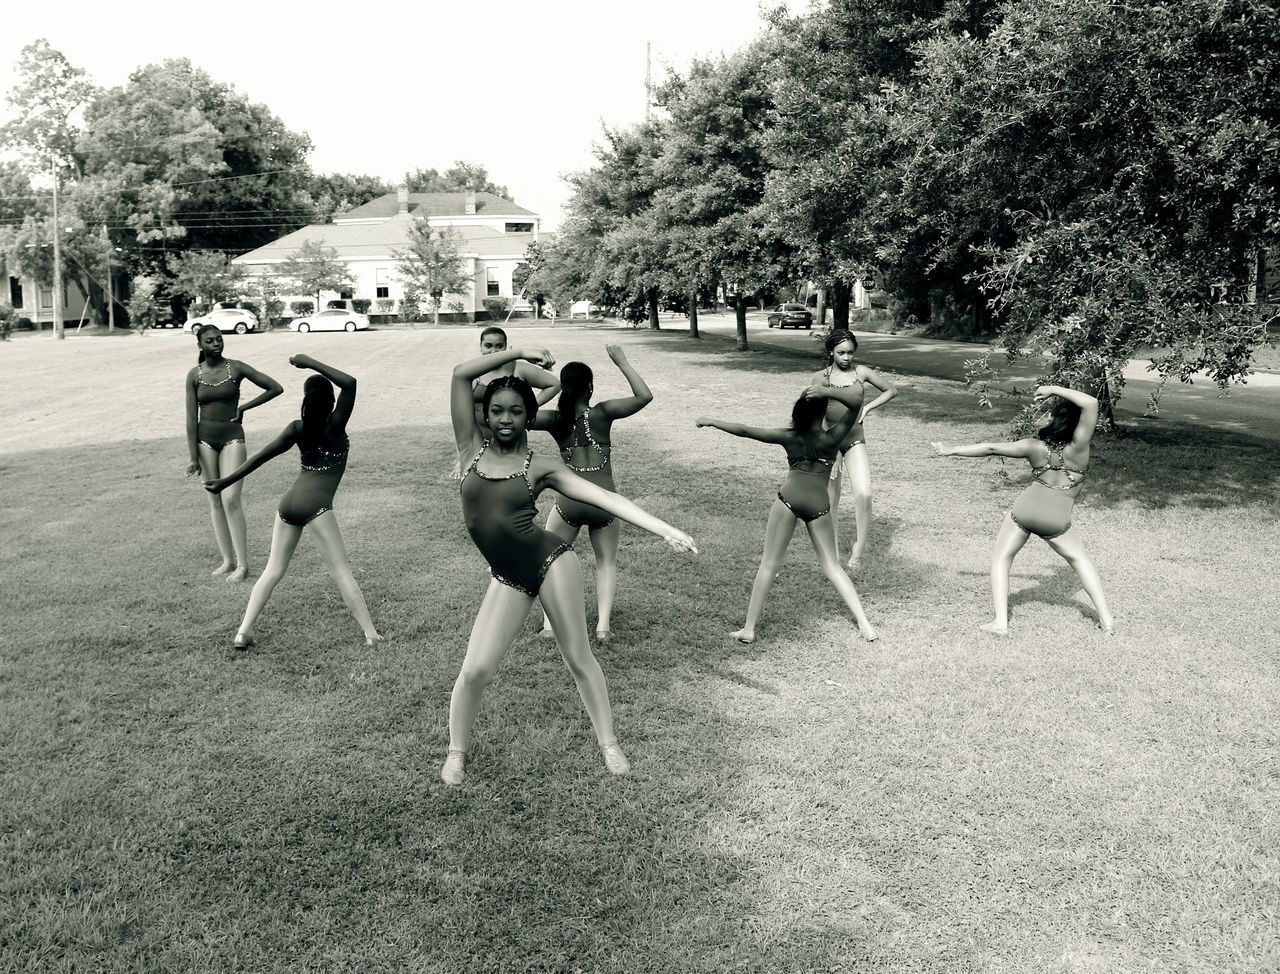 Beautiful stock photos of spinnen, full length, friendship, vitality, tree